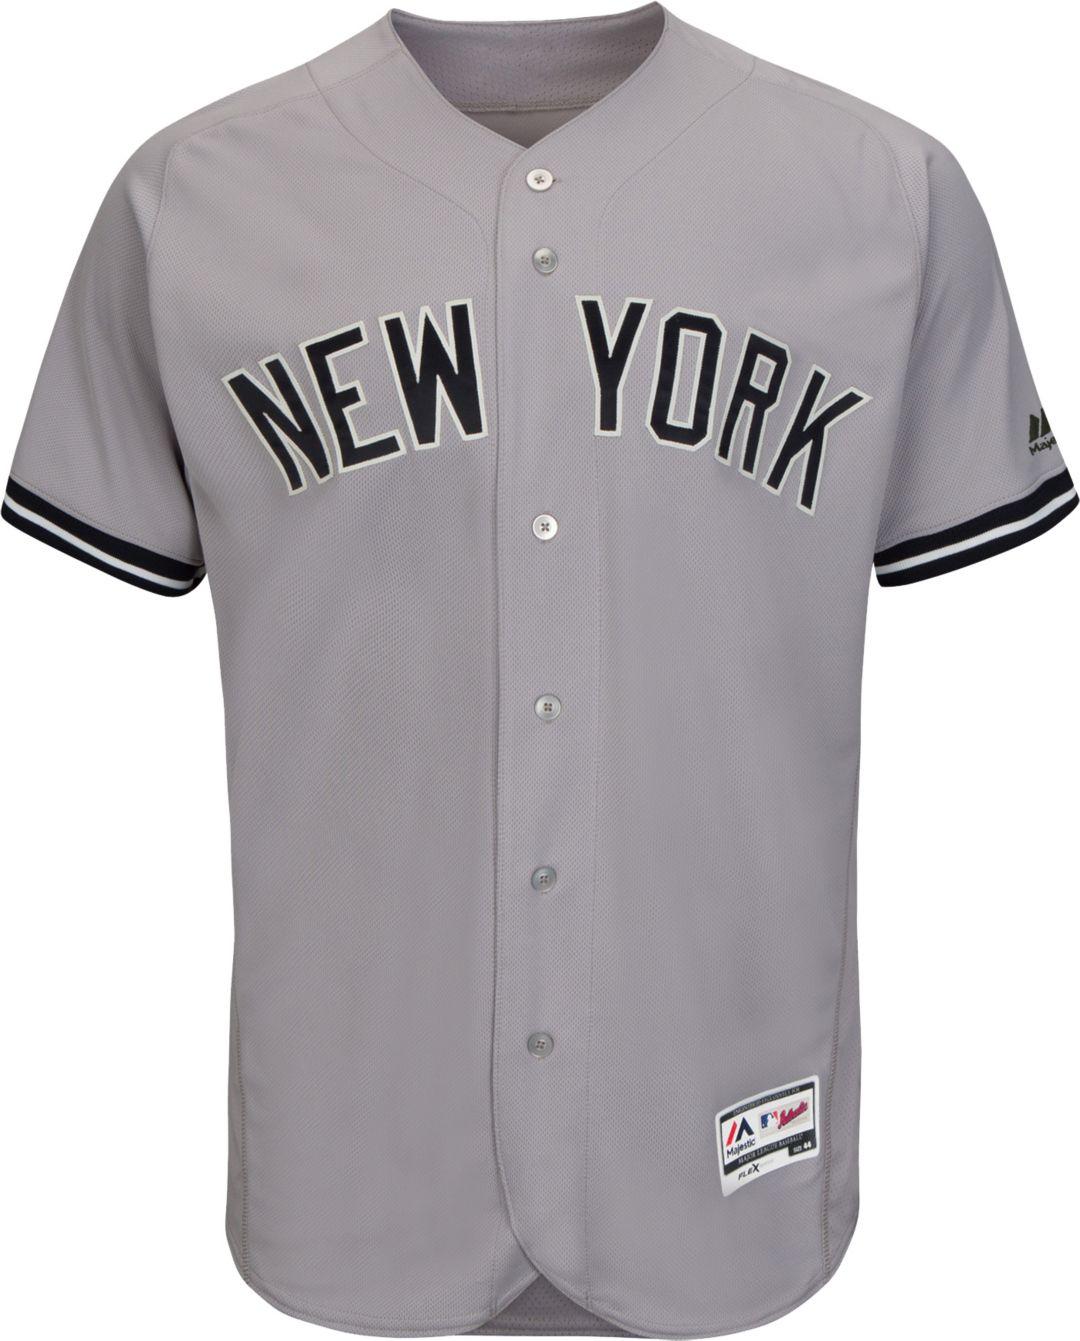 newest 984c2 31120 Majestic Men's Authentic New York Yankees Didi Gregorius #18 Road Grey Flex  Base On-Field Jersey